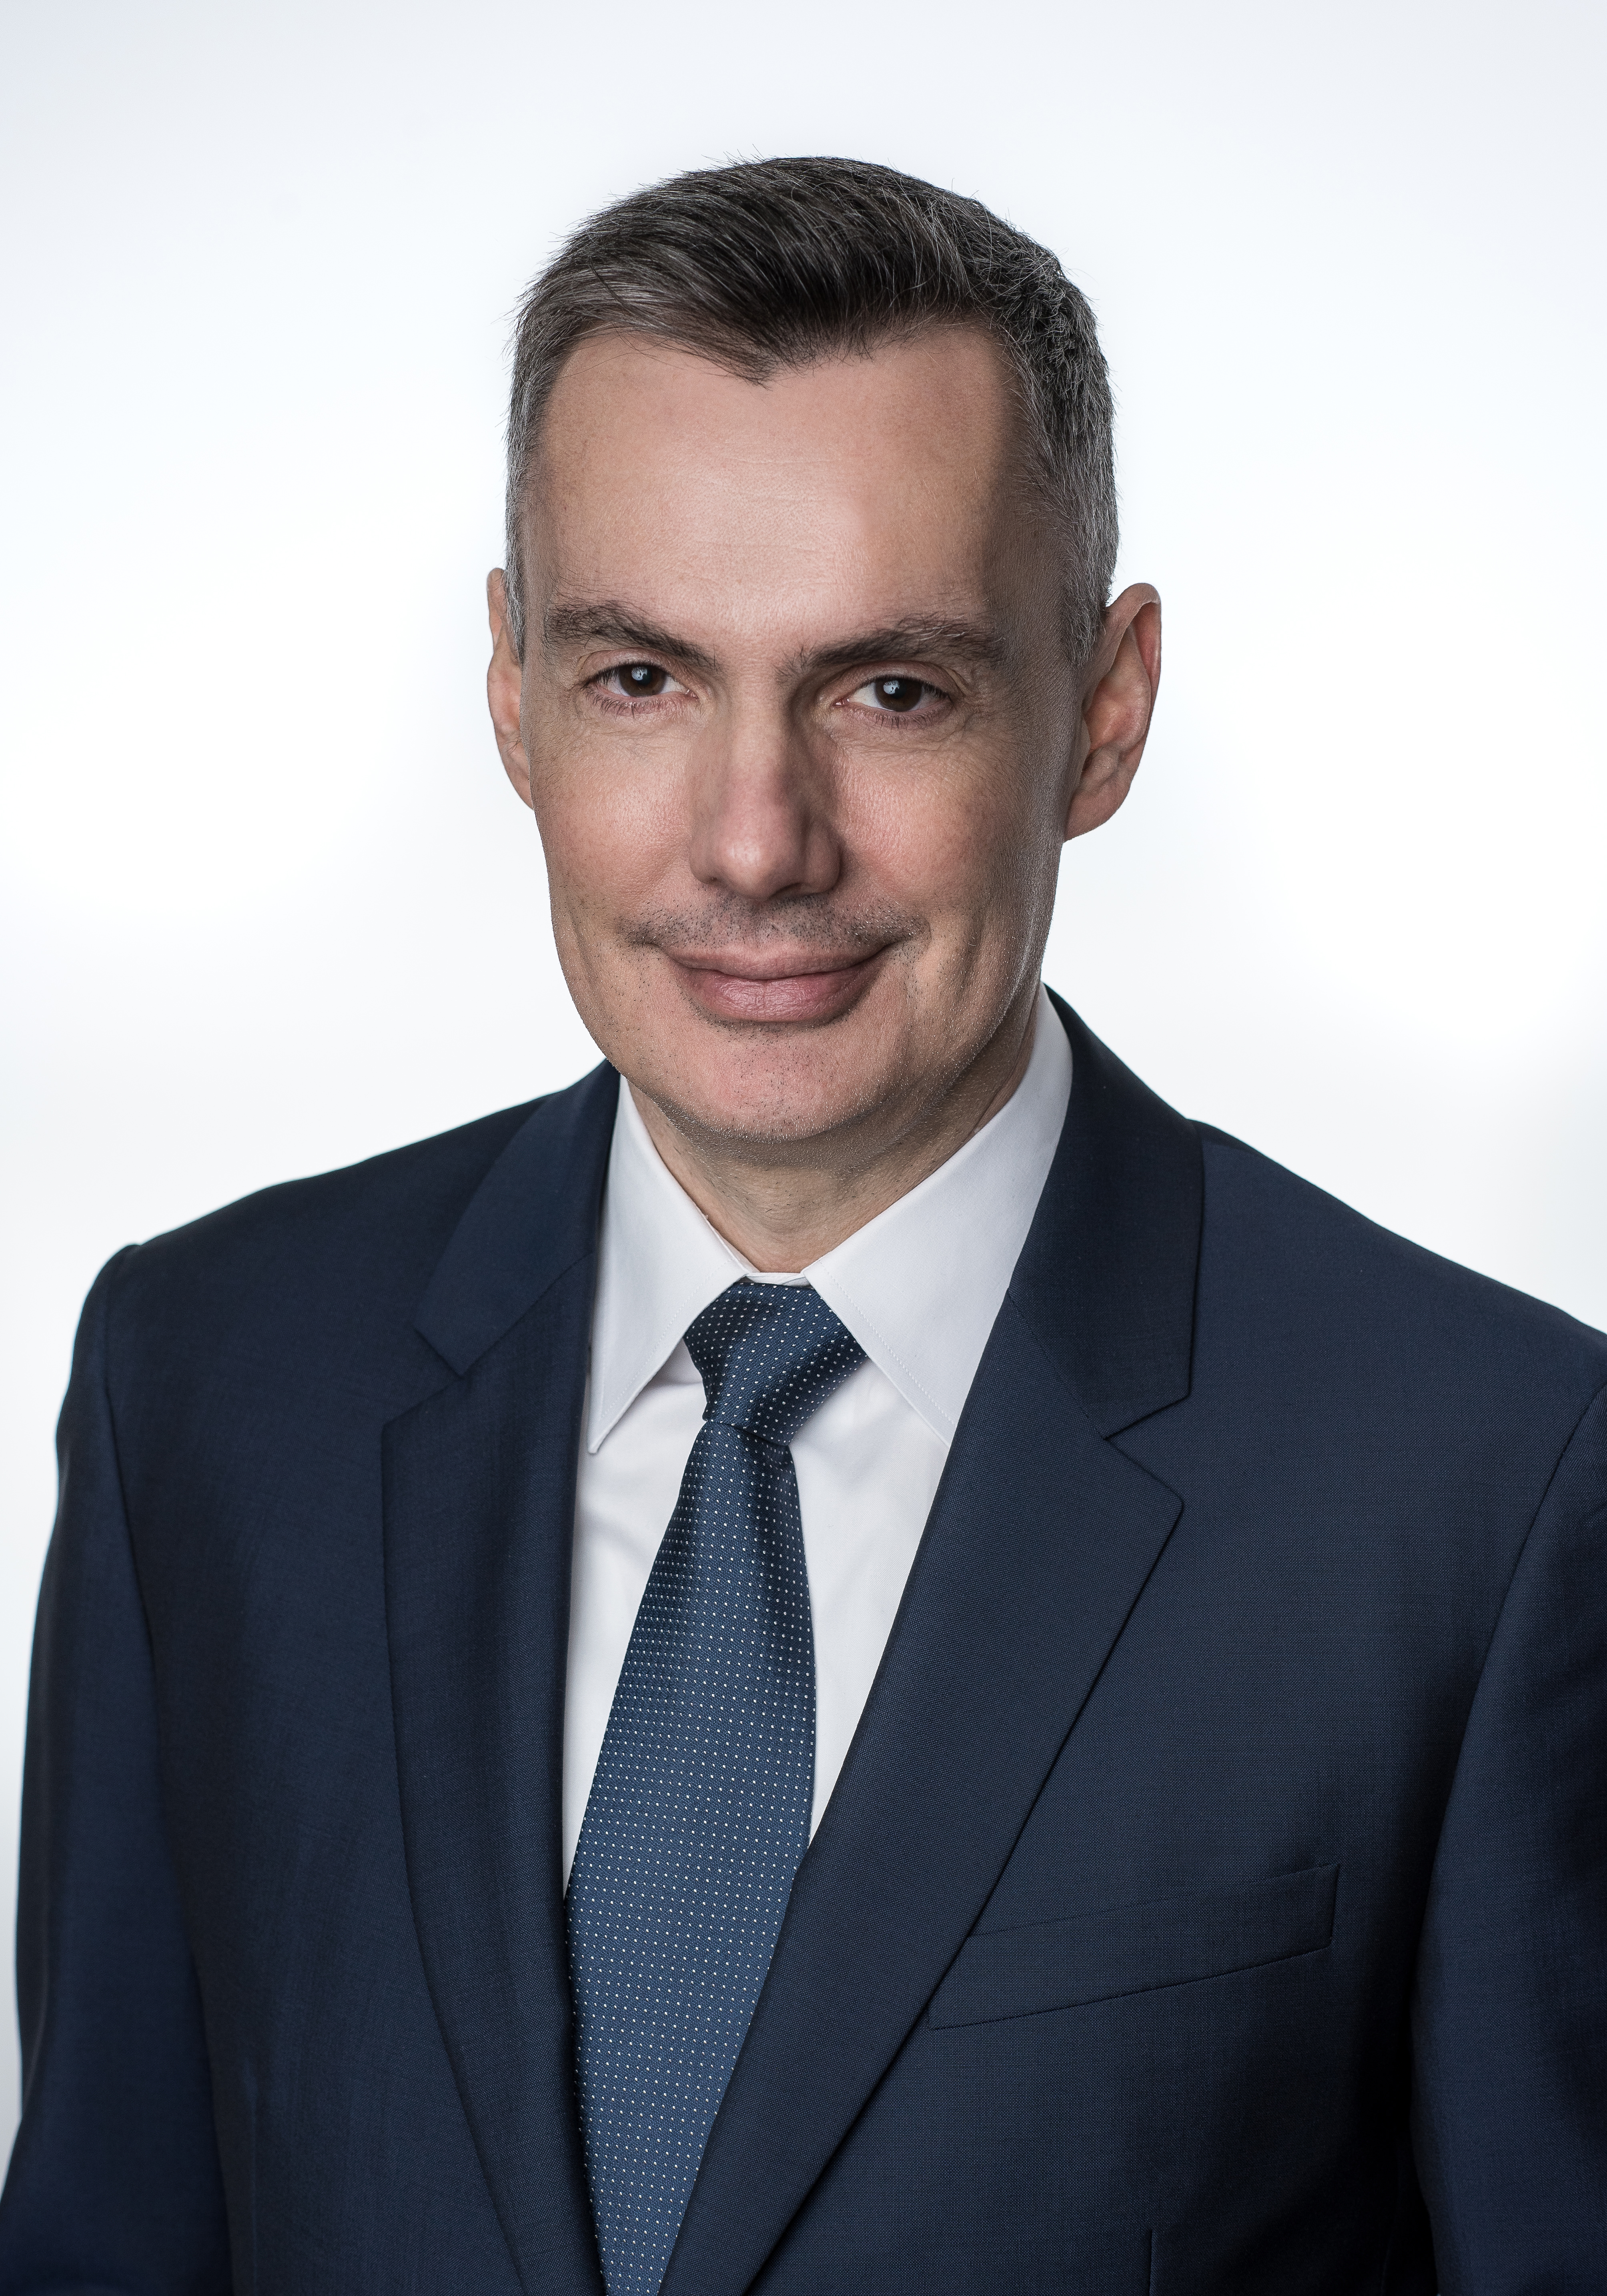 Nicolas Economou